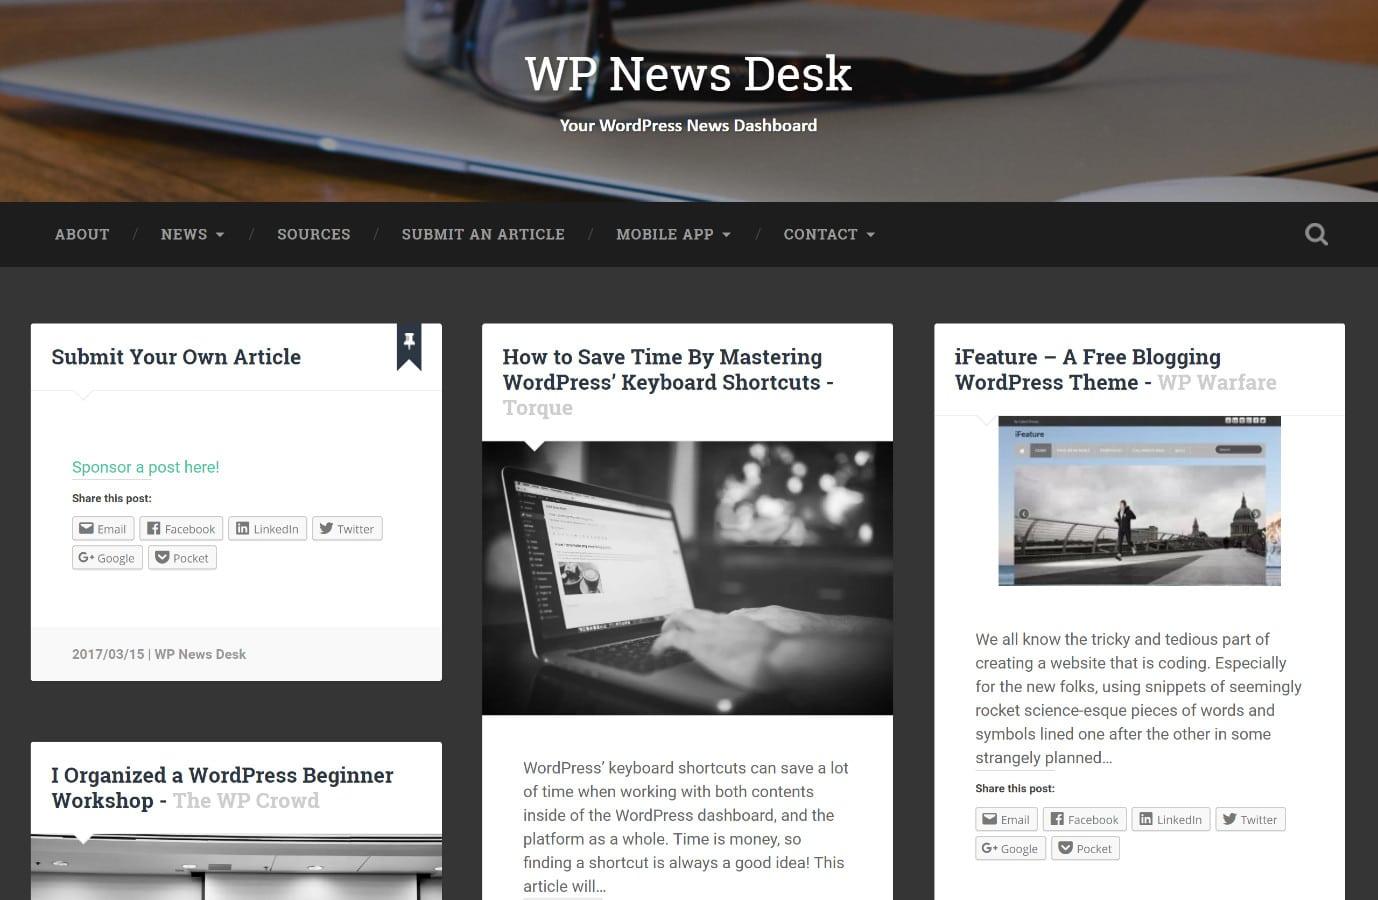 WP News Desk